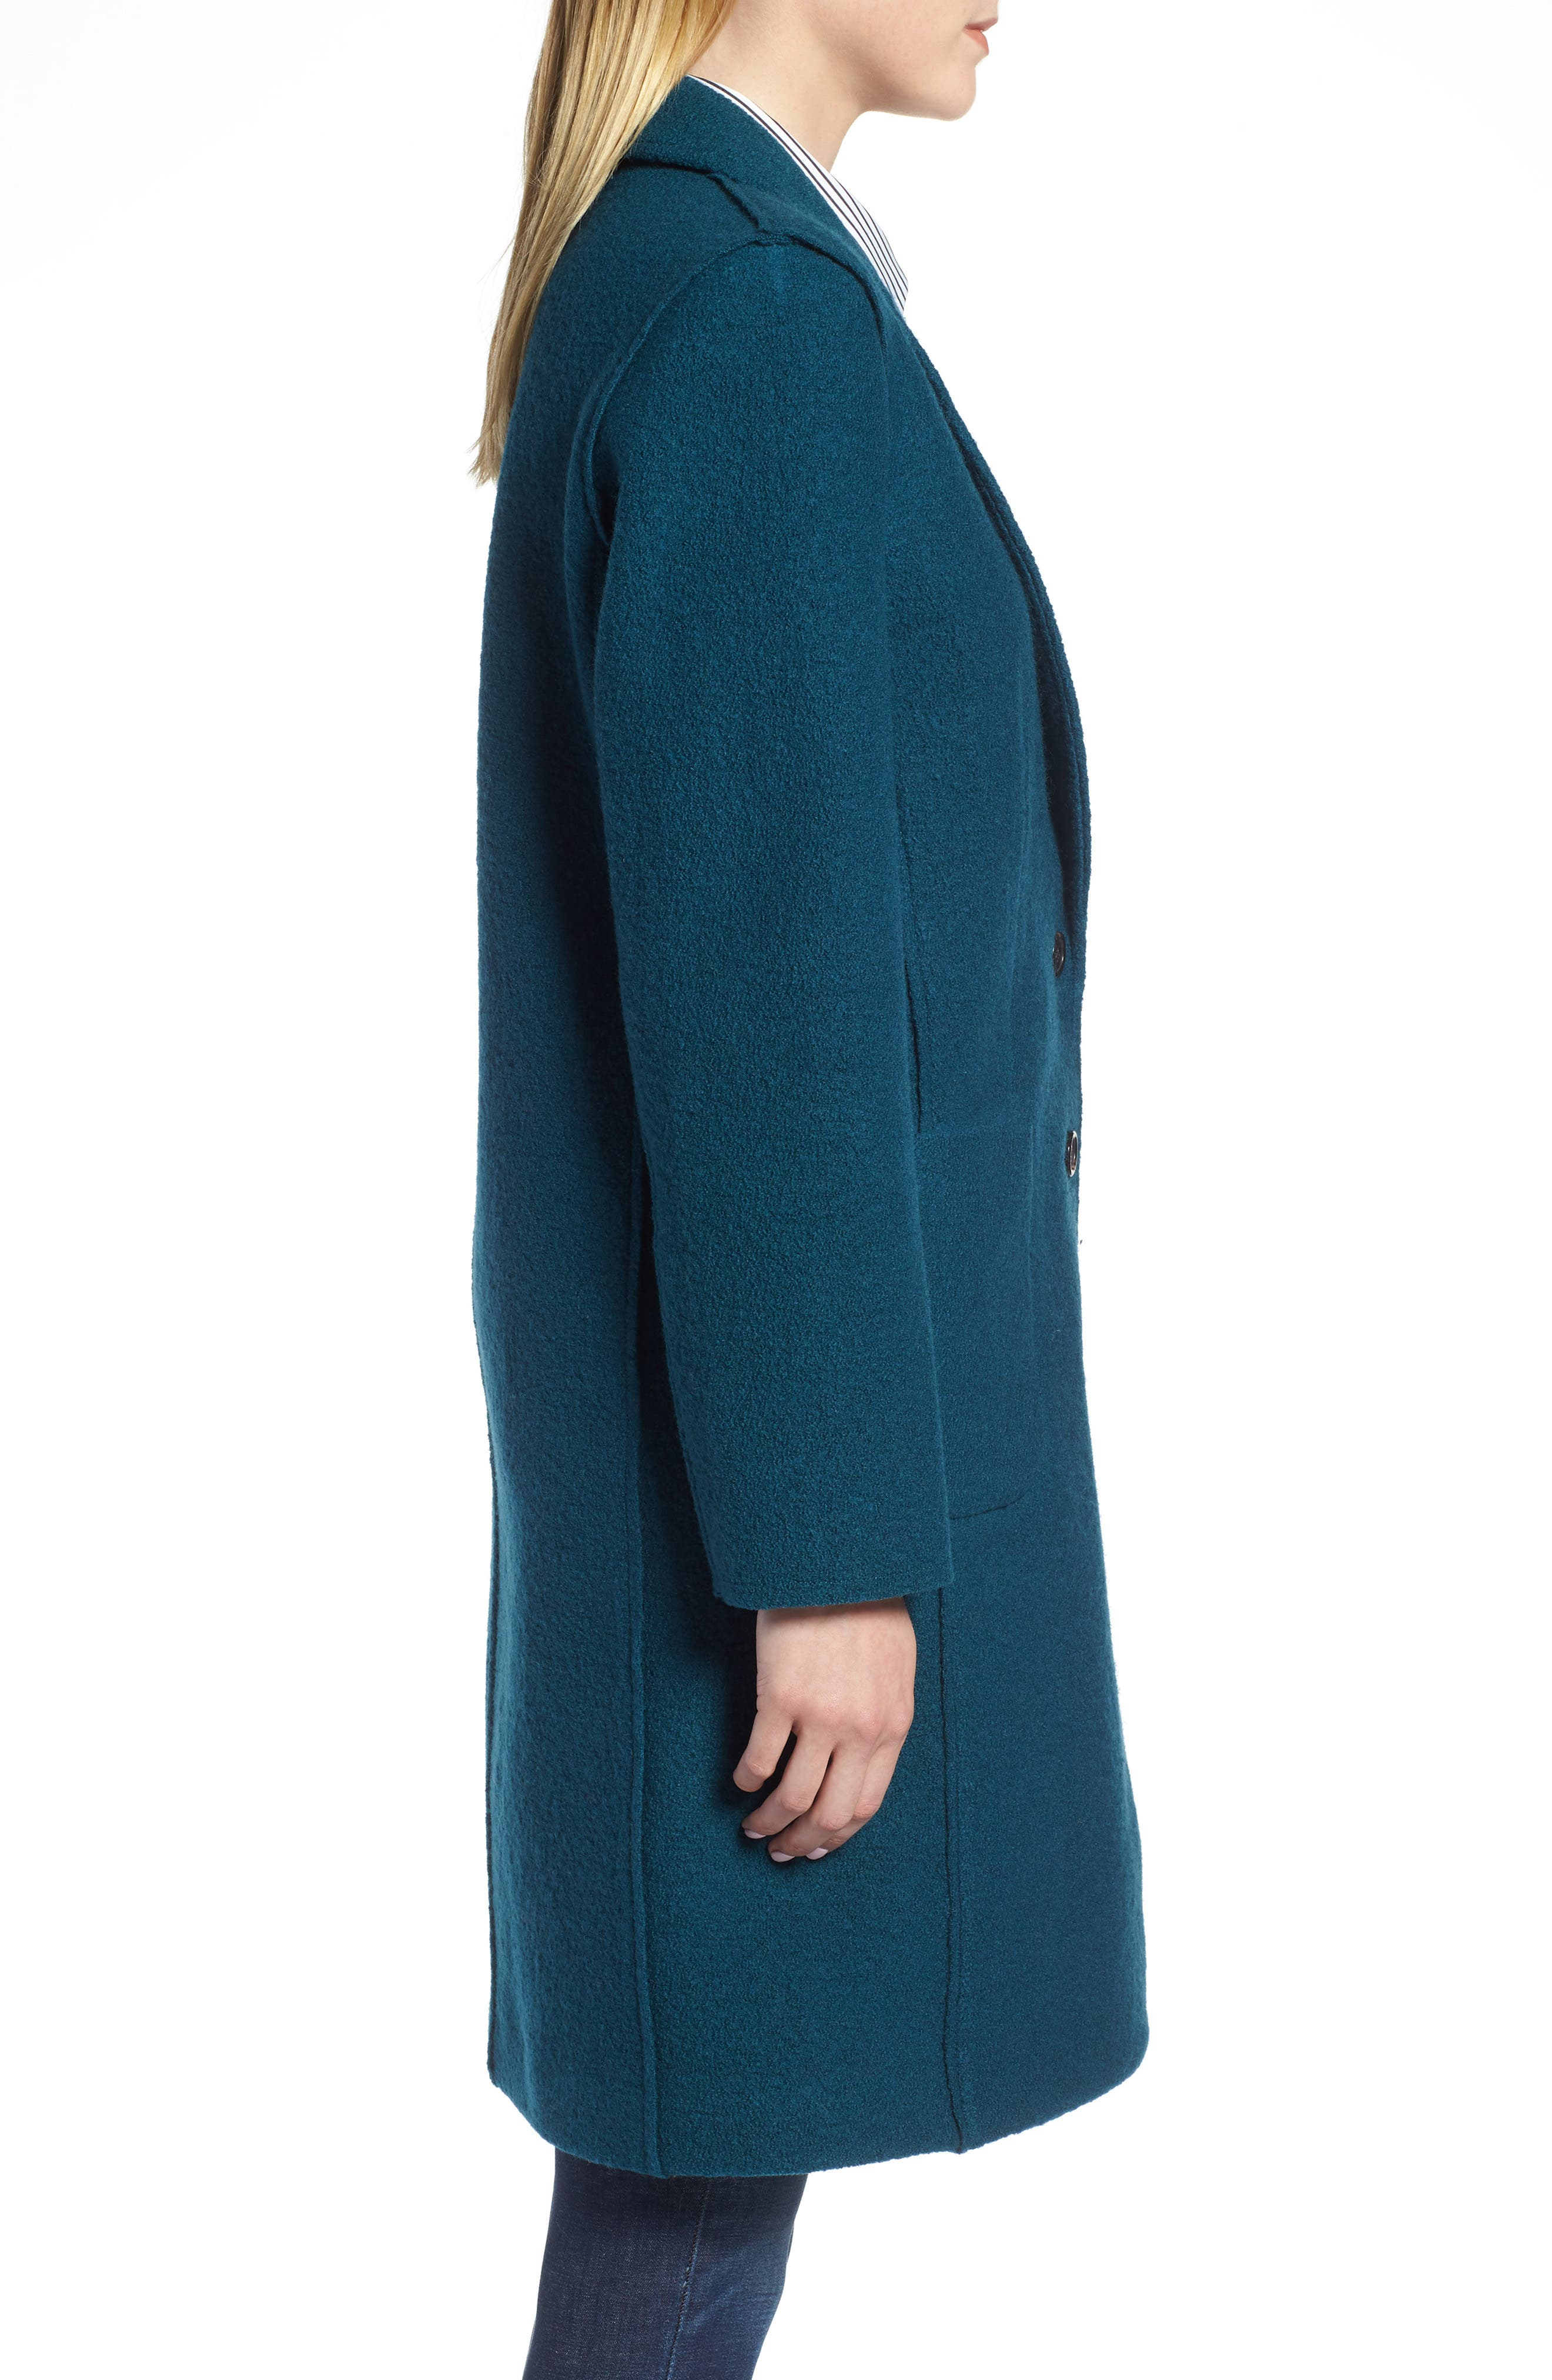 Olga Boiled Wool Topcoat,                             Alternate thumbnail 3, color,                             Winter Pine